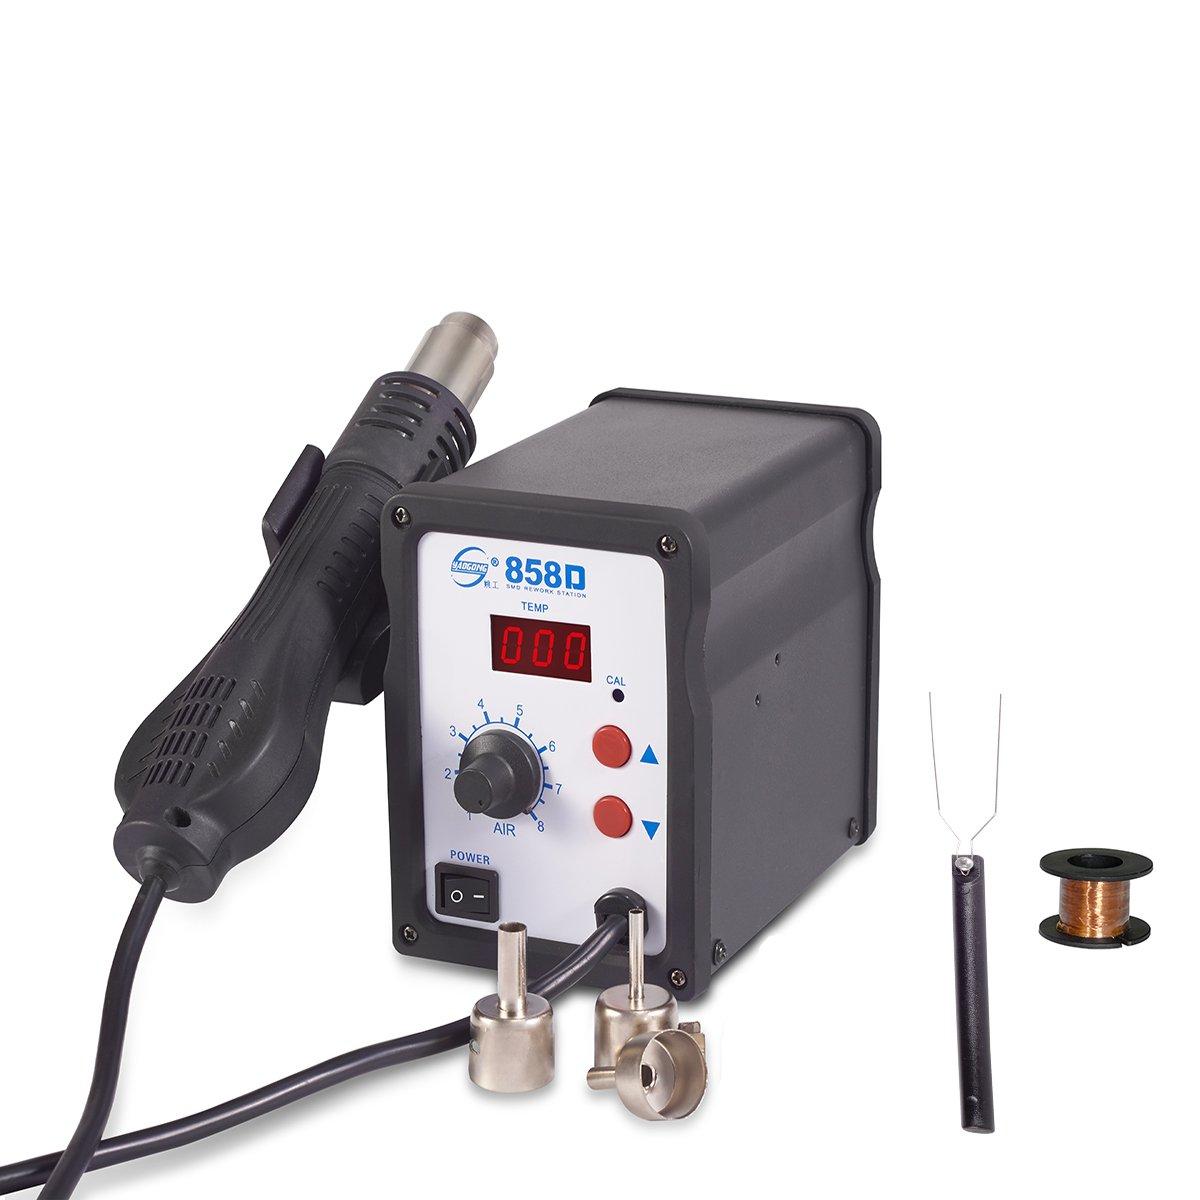 YAOGONG 858D SMD Hot Air Gun Rework Station Digital Solder 4Nozzles 110V 700W